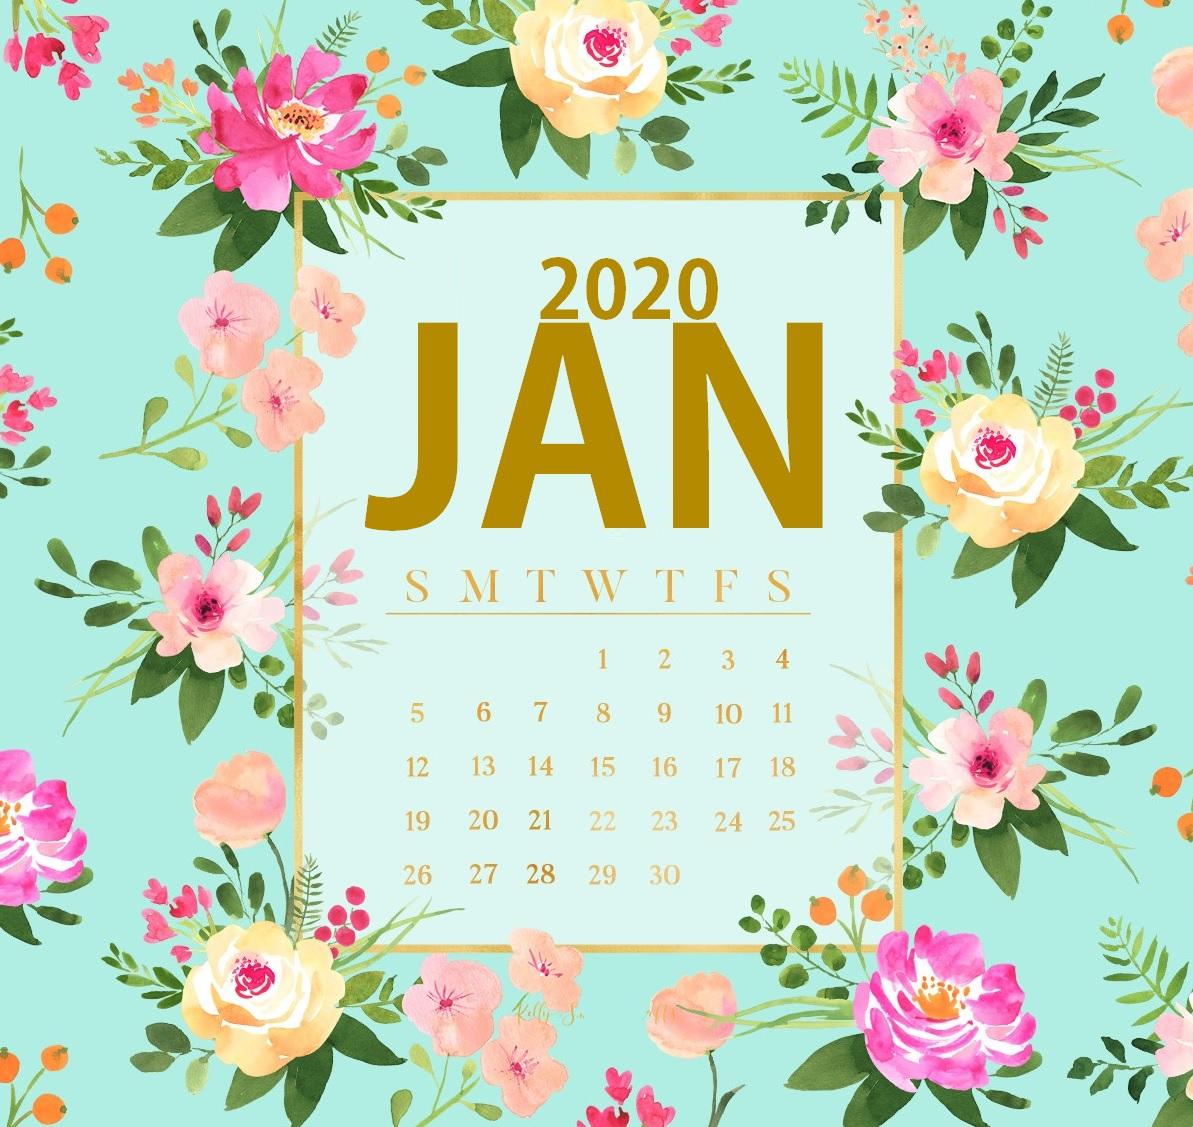 download download iPhone January 2020 Wallpaper Calendar 1193x1127